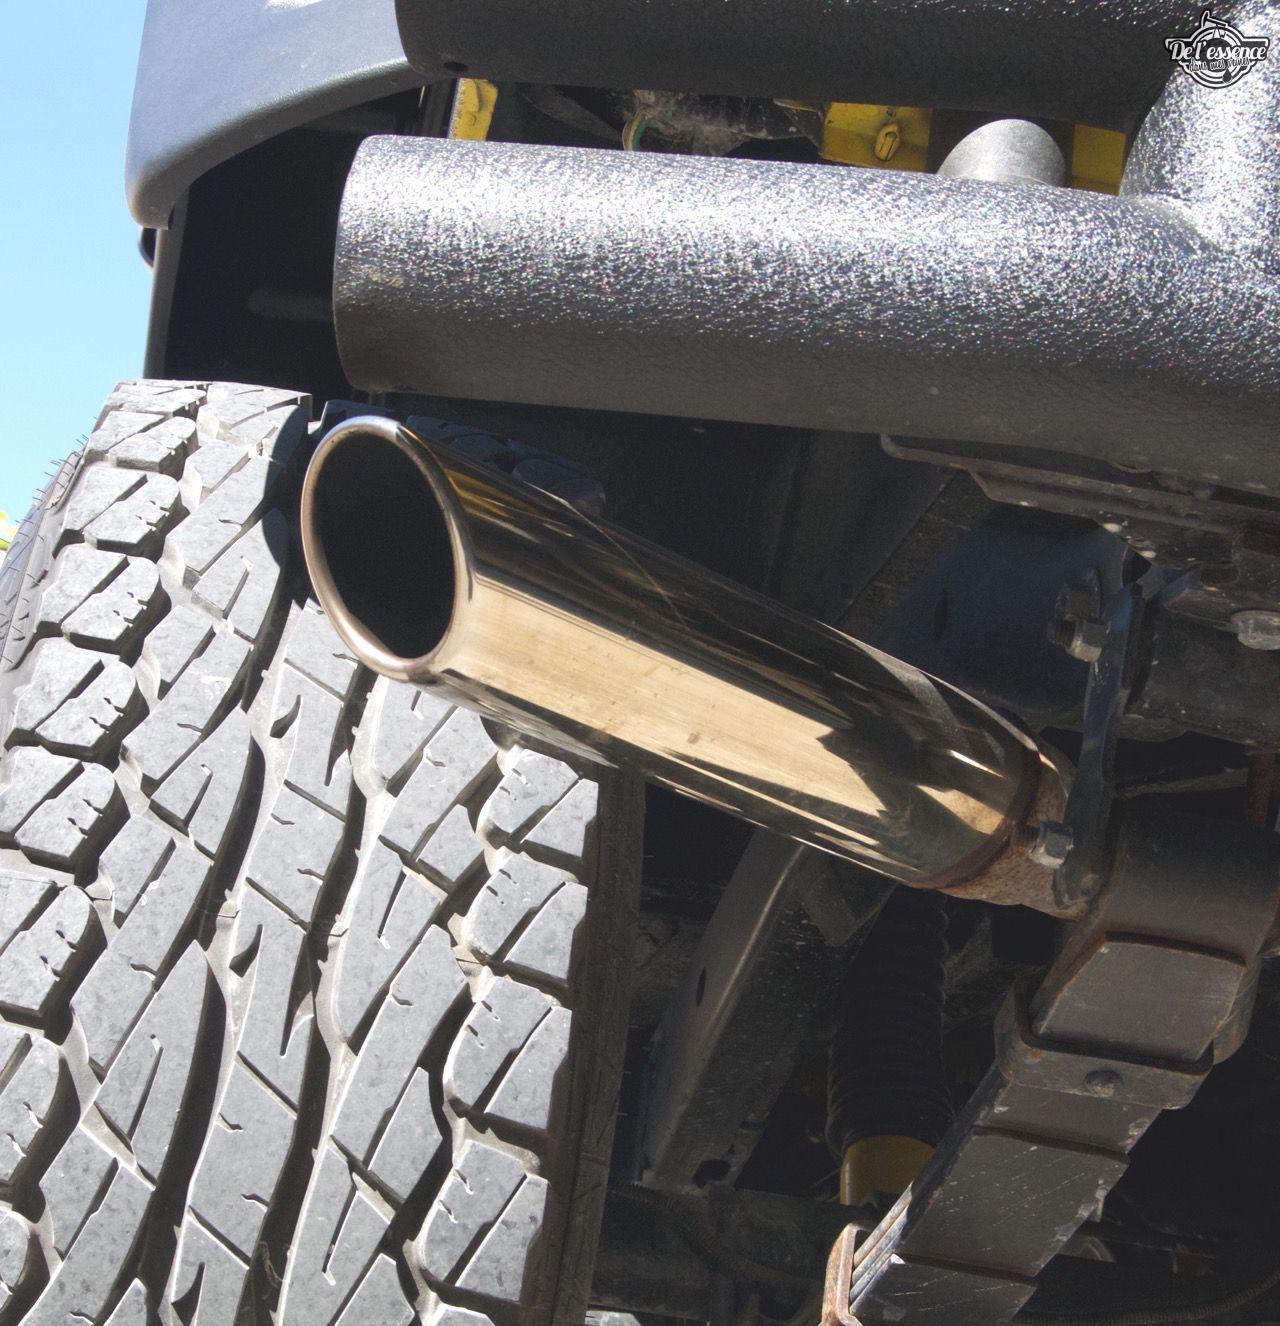 '82 Jeep CJ-7 Laredo - Quand tu te fais chier sur la route... 71